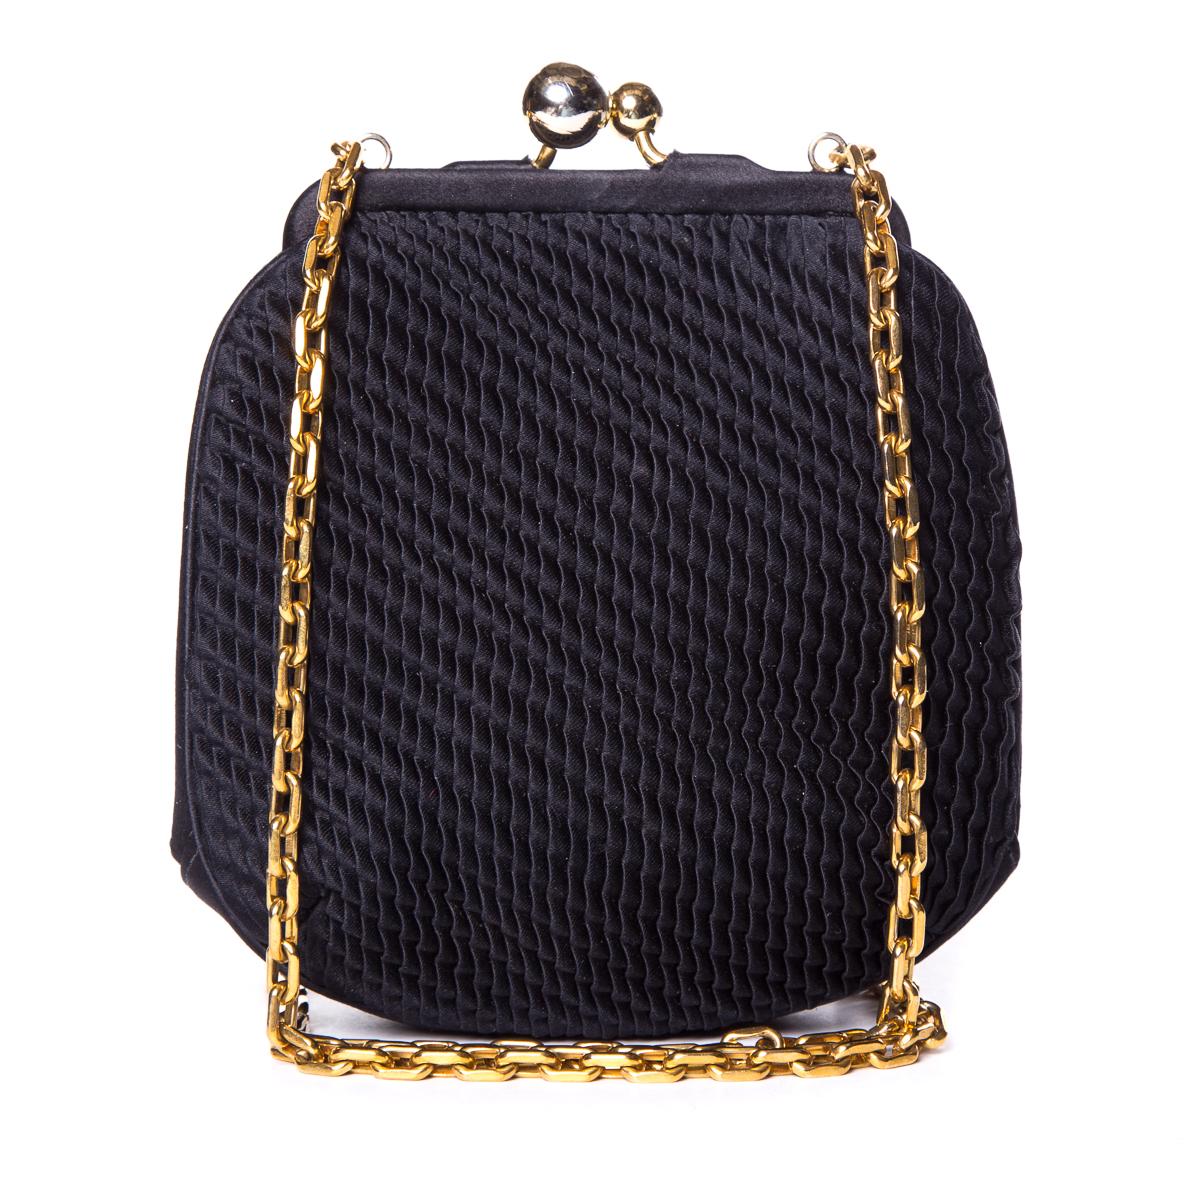 Knit Evening Bag 46